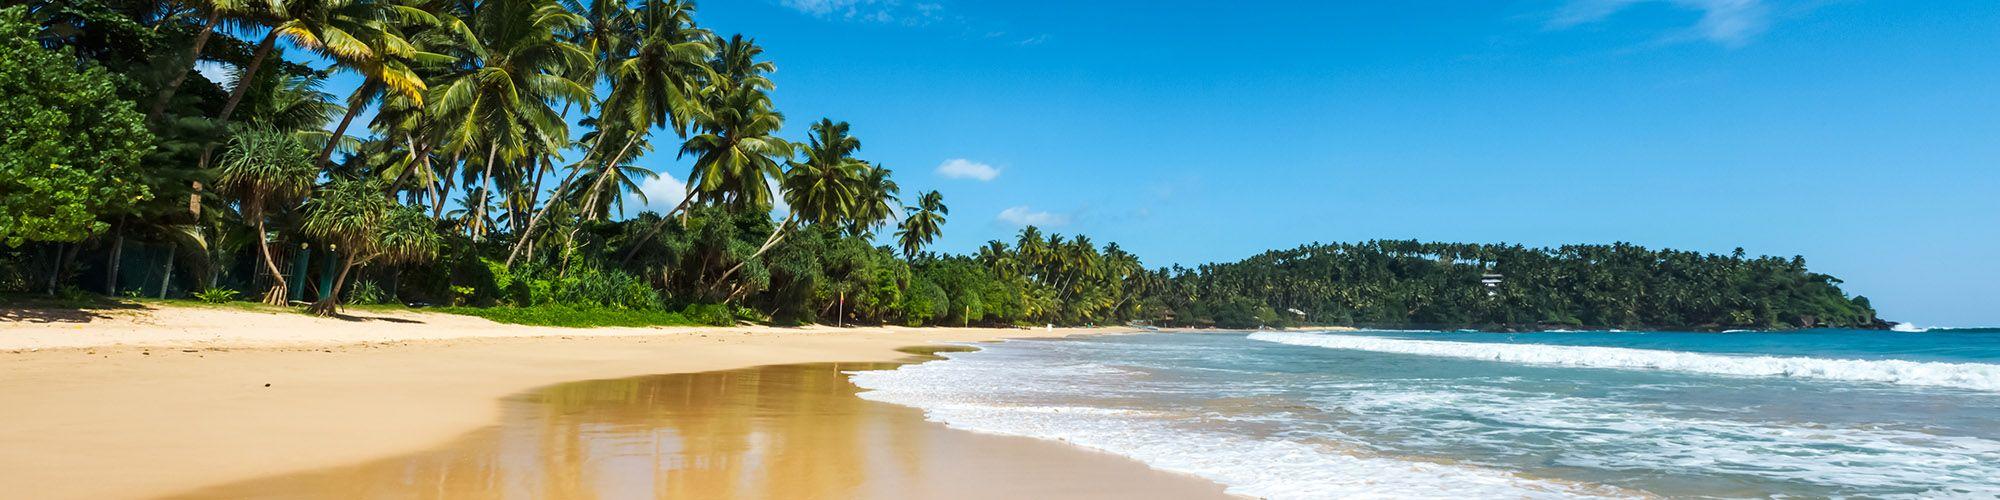 Beach & Relaxation Tours in Sri Lanka